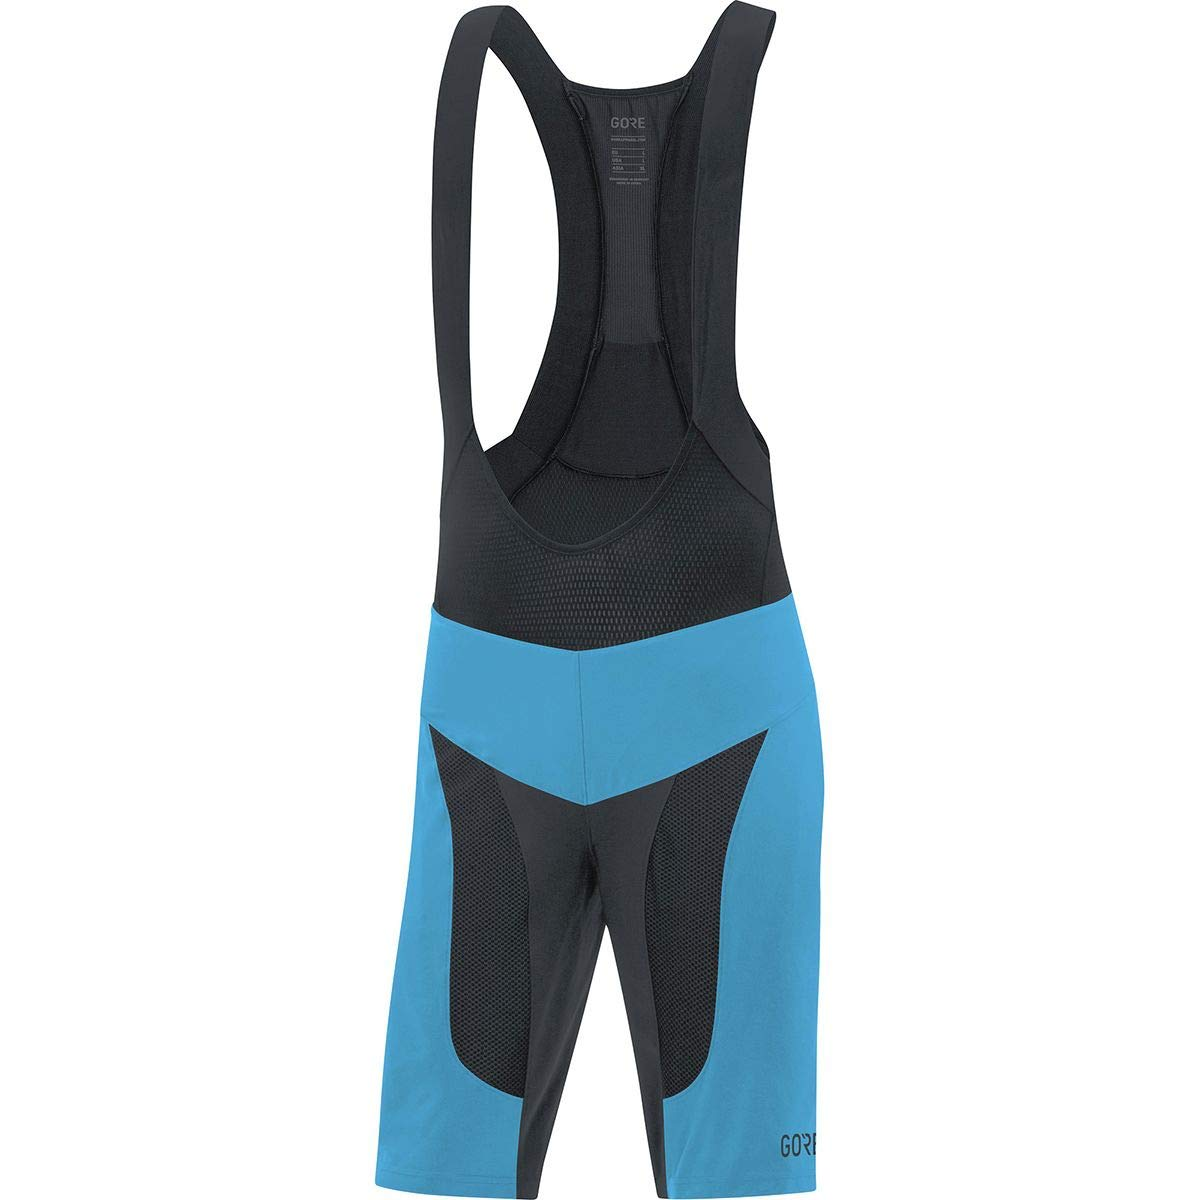 GORE Wear C7 2in1 Men's Mountain Cycling Bib Shorts With Seat Insert, S, Blue/Black